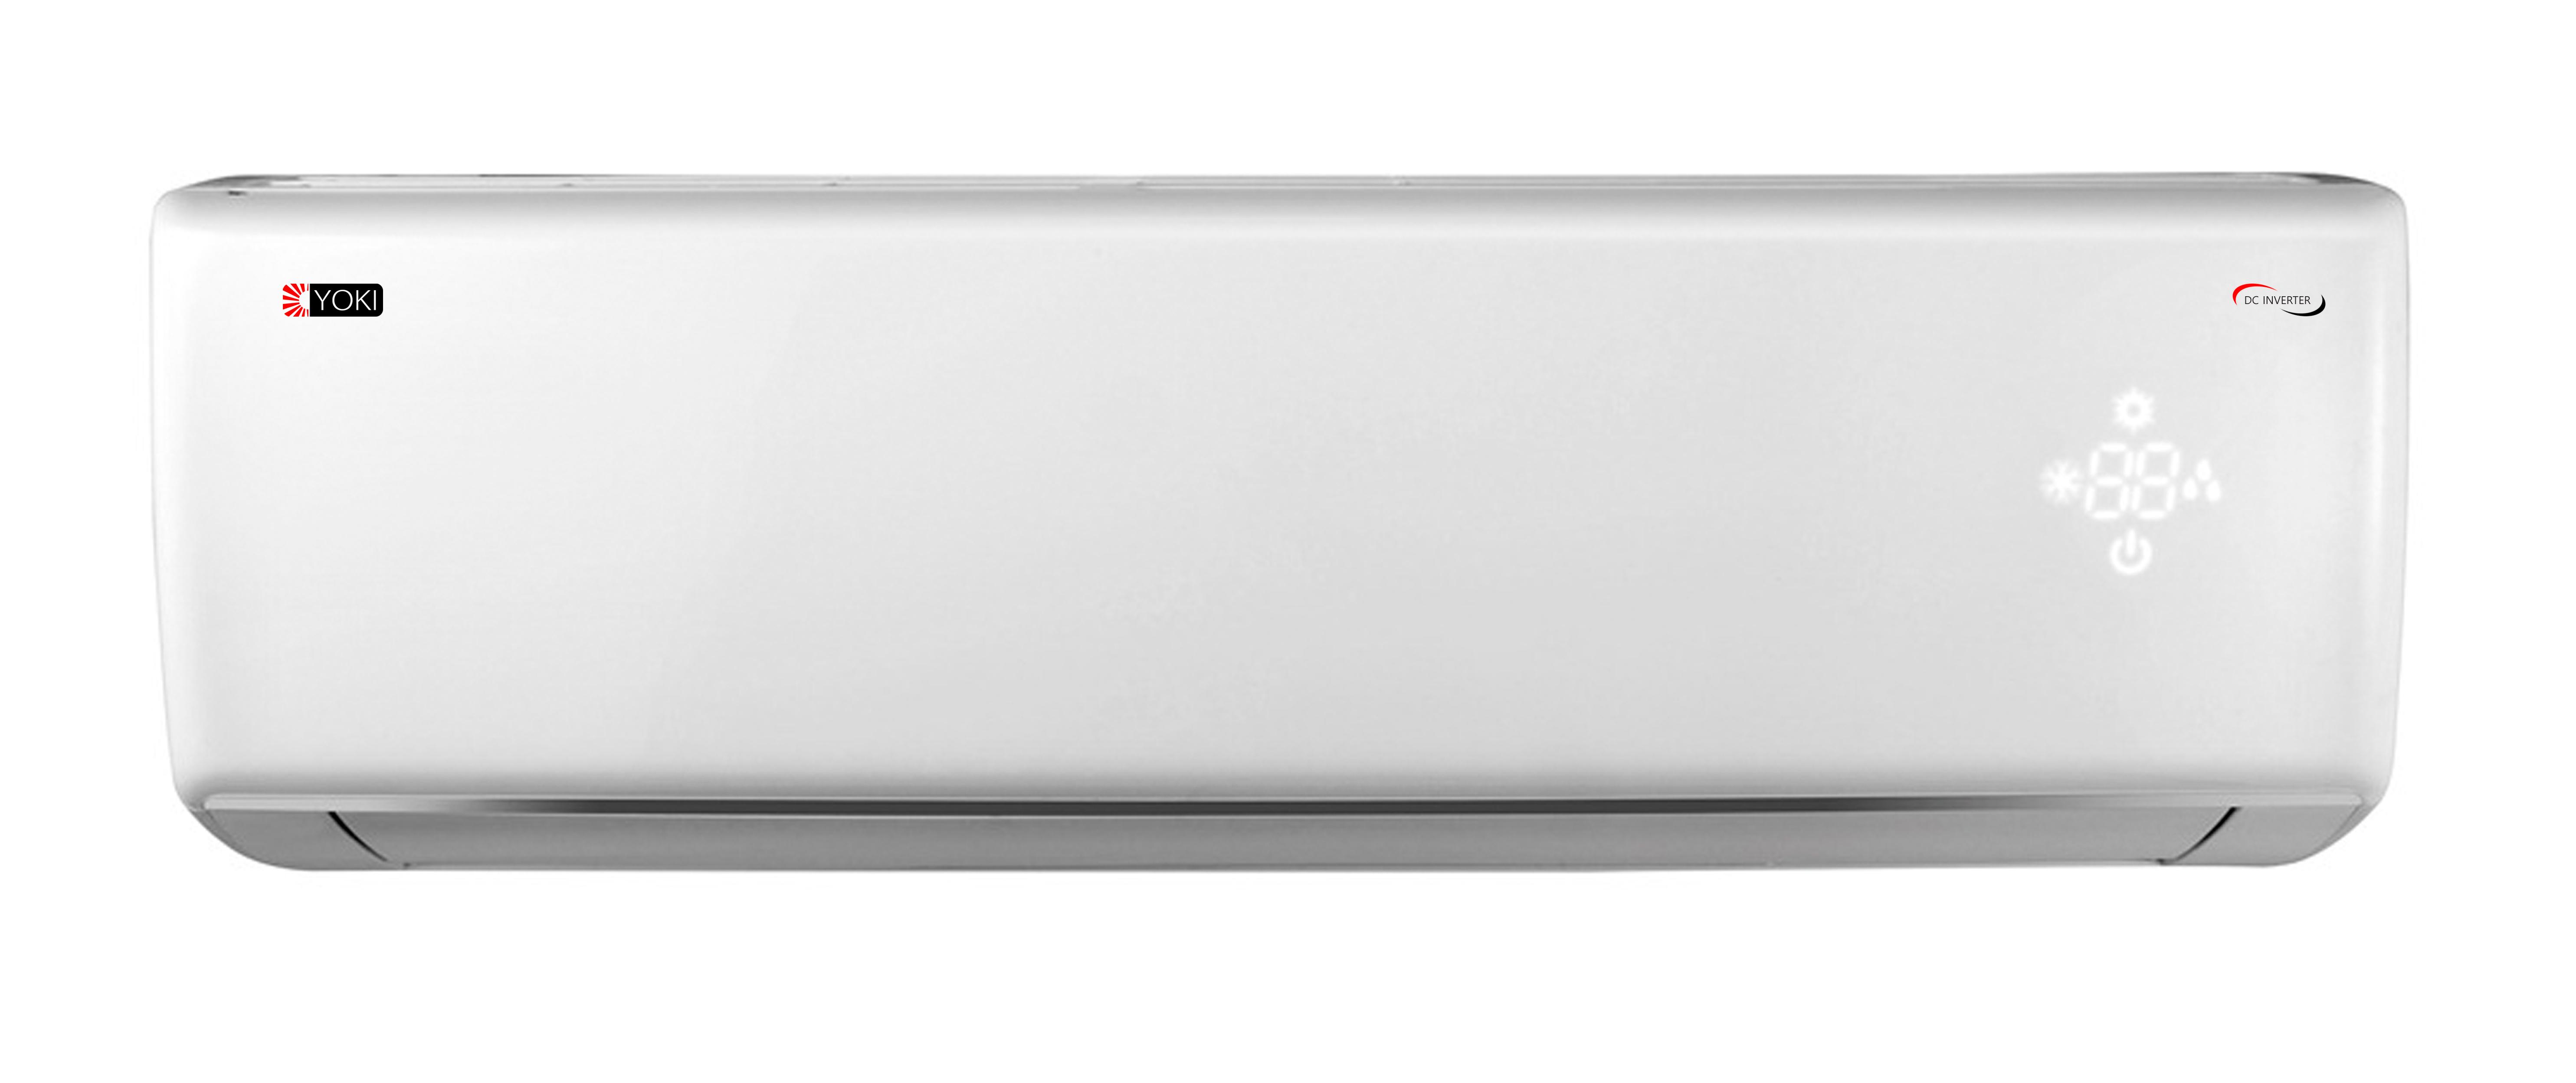 Aer conditionat Yoki YW09IT DC Inverter 9000 BTU